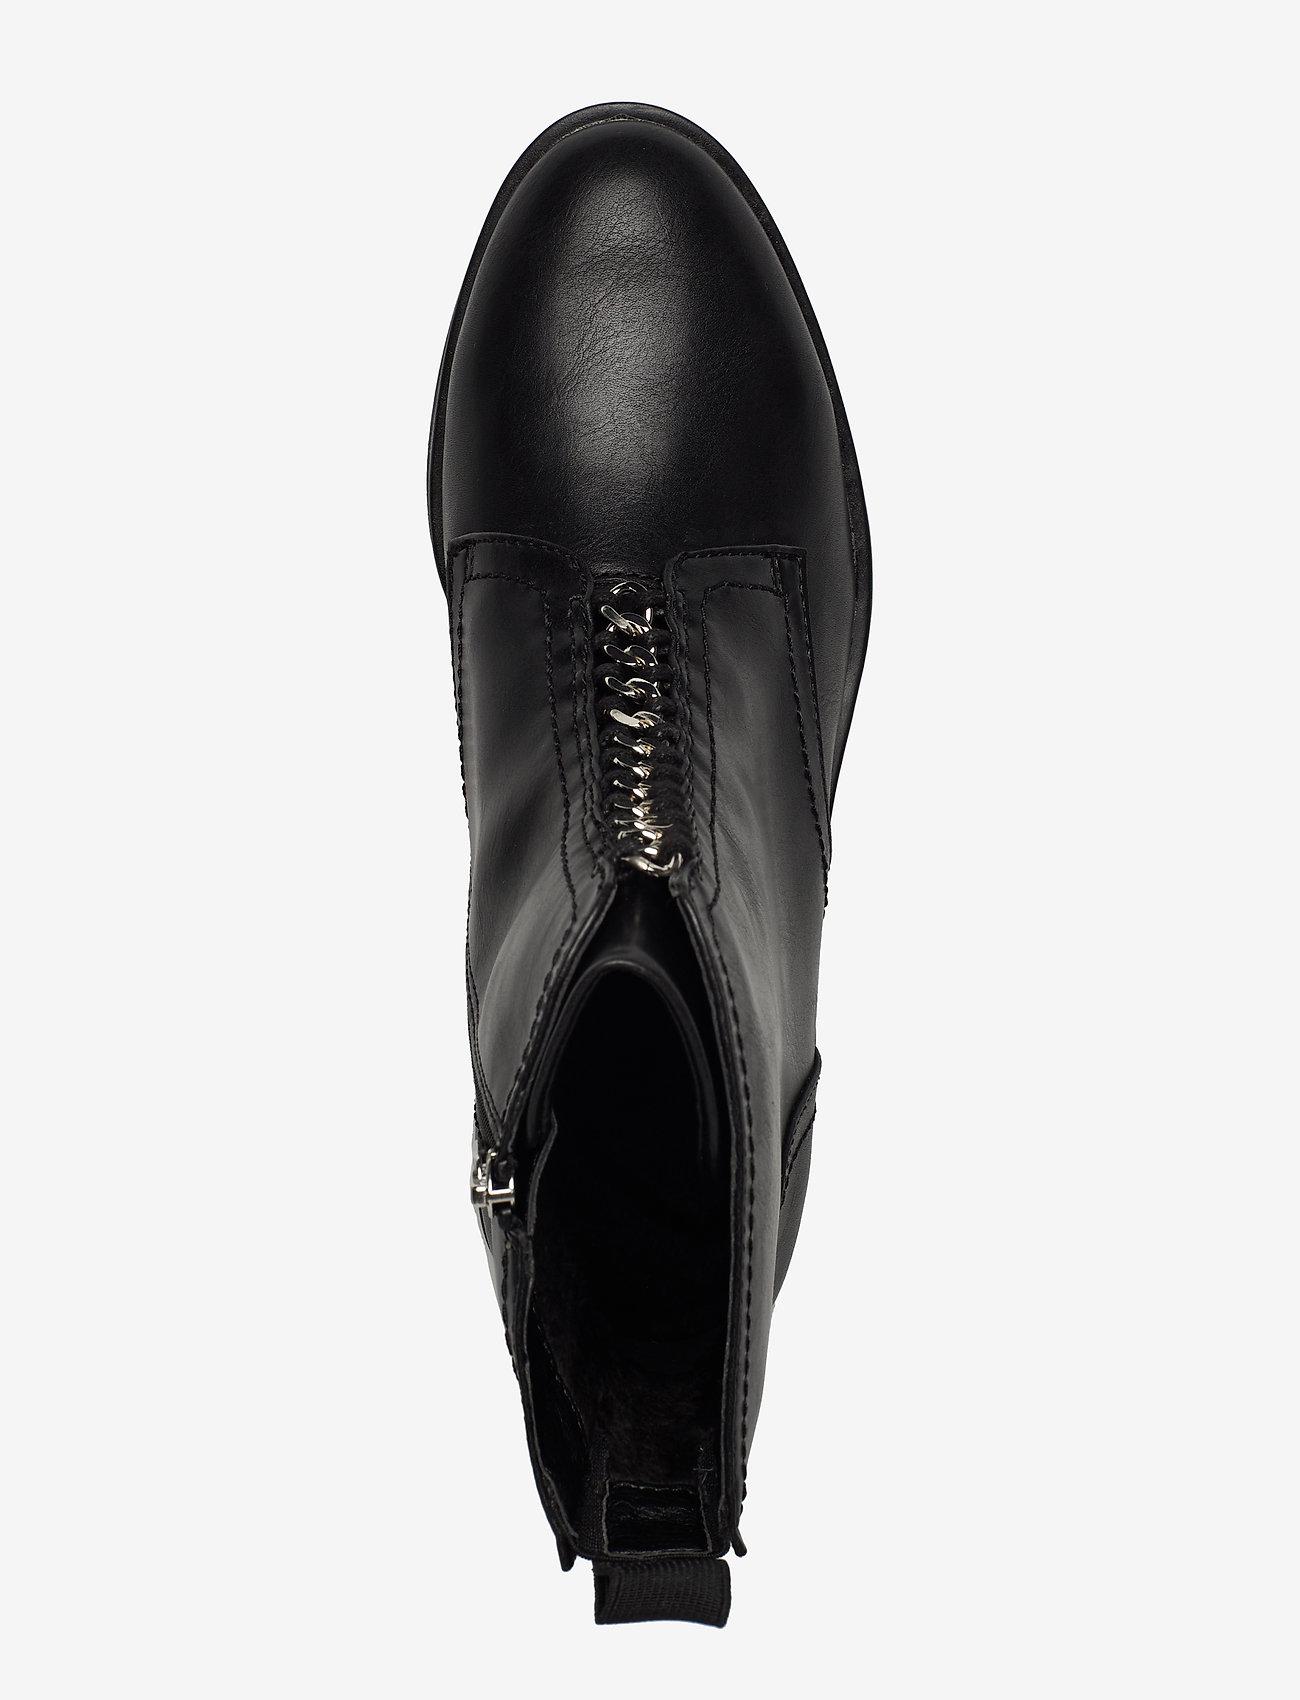 Woms Boots (Black) - Tamaris eabPgQ